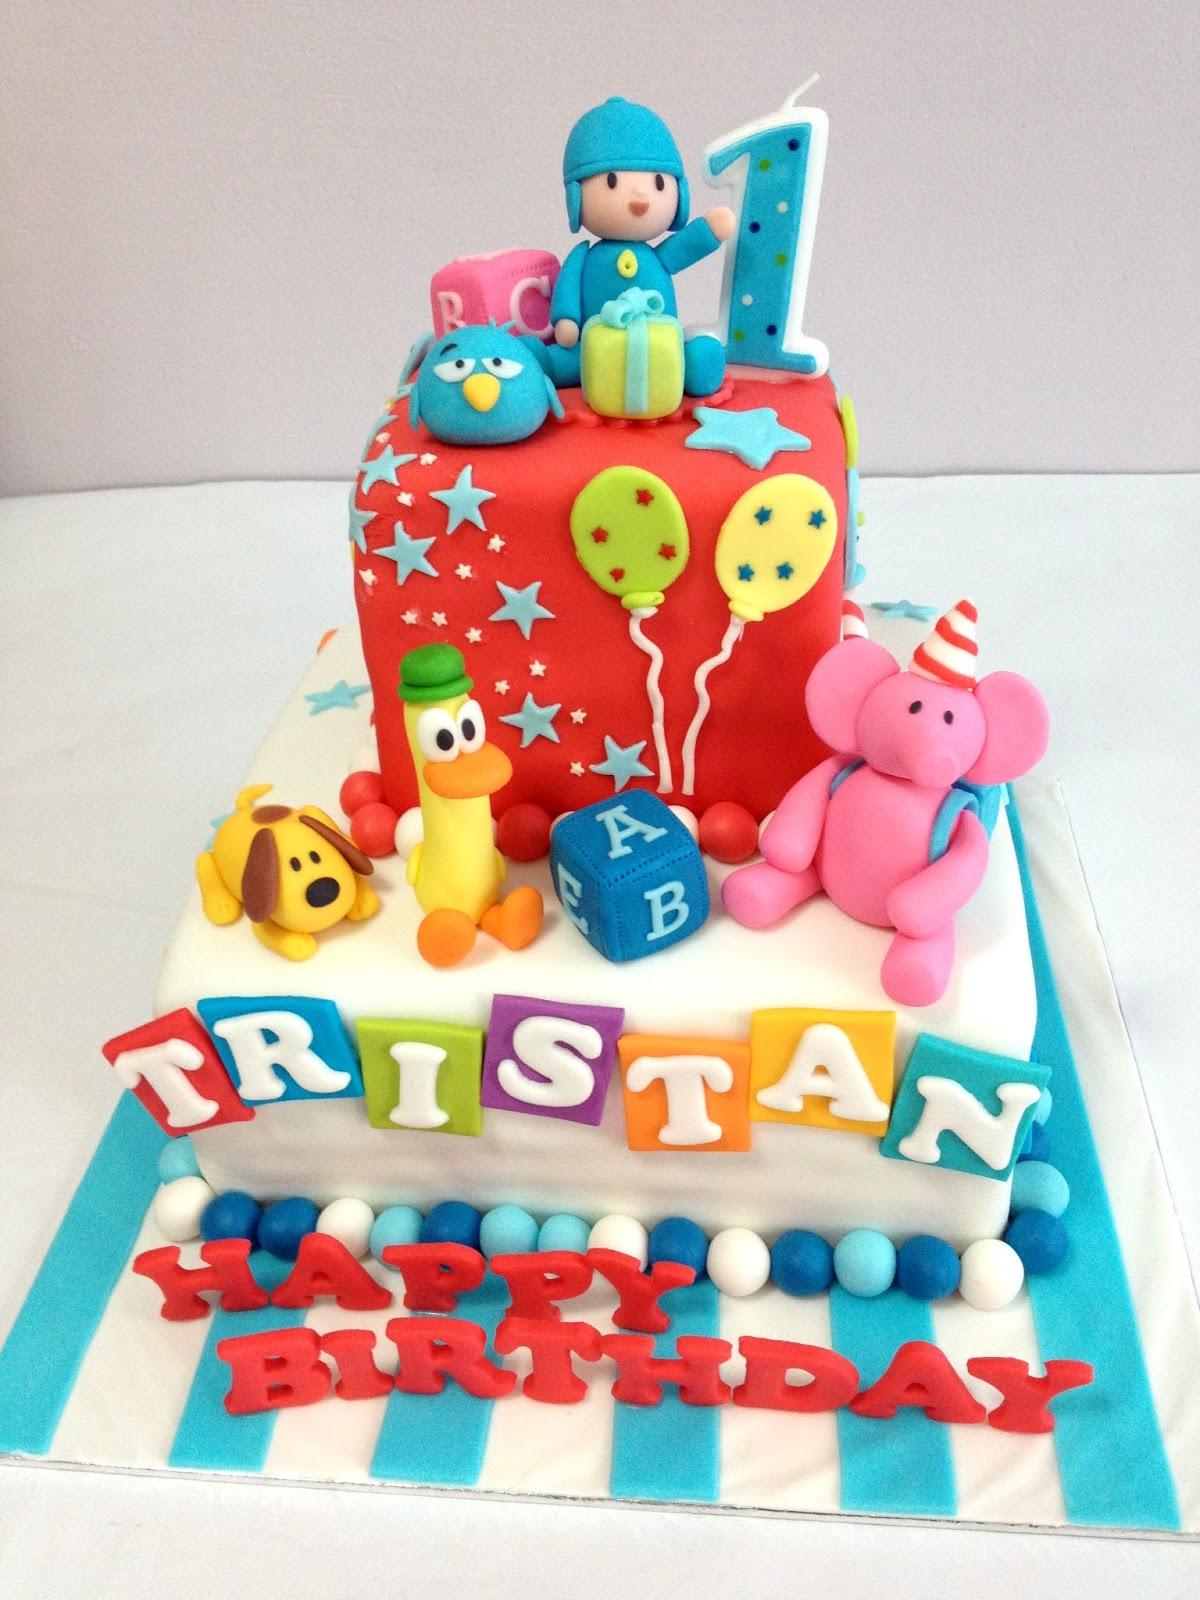 Oven Creations Happy 1st Birthday Tristan